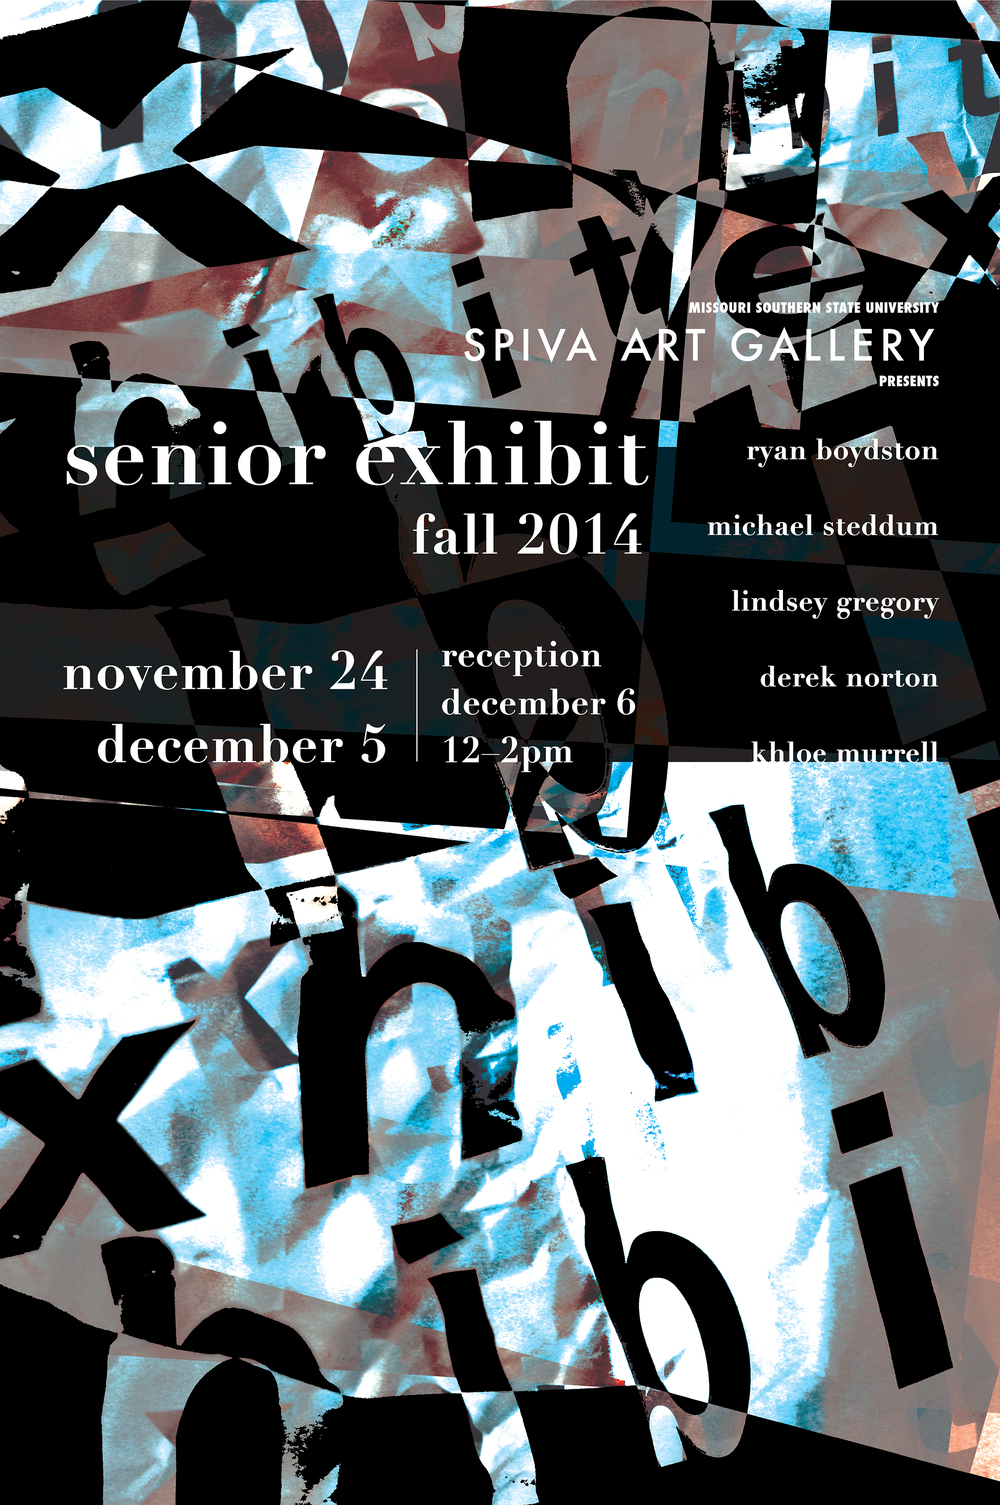 Senior Exhibit Fall 2014 24x36